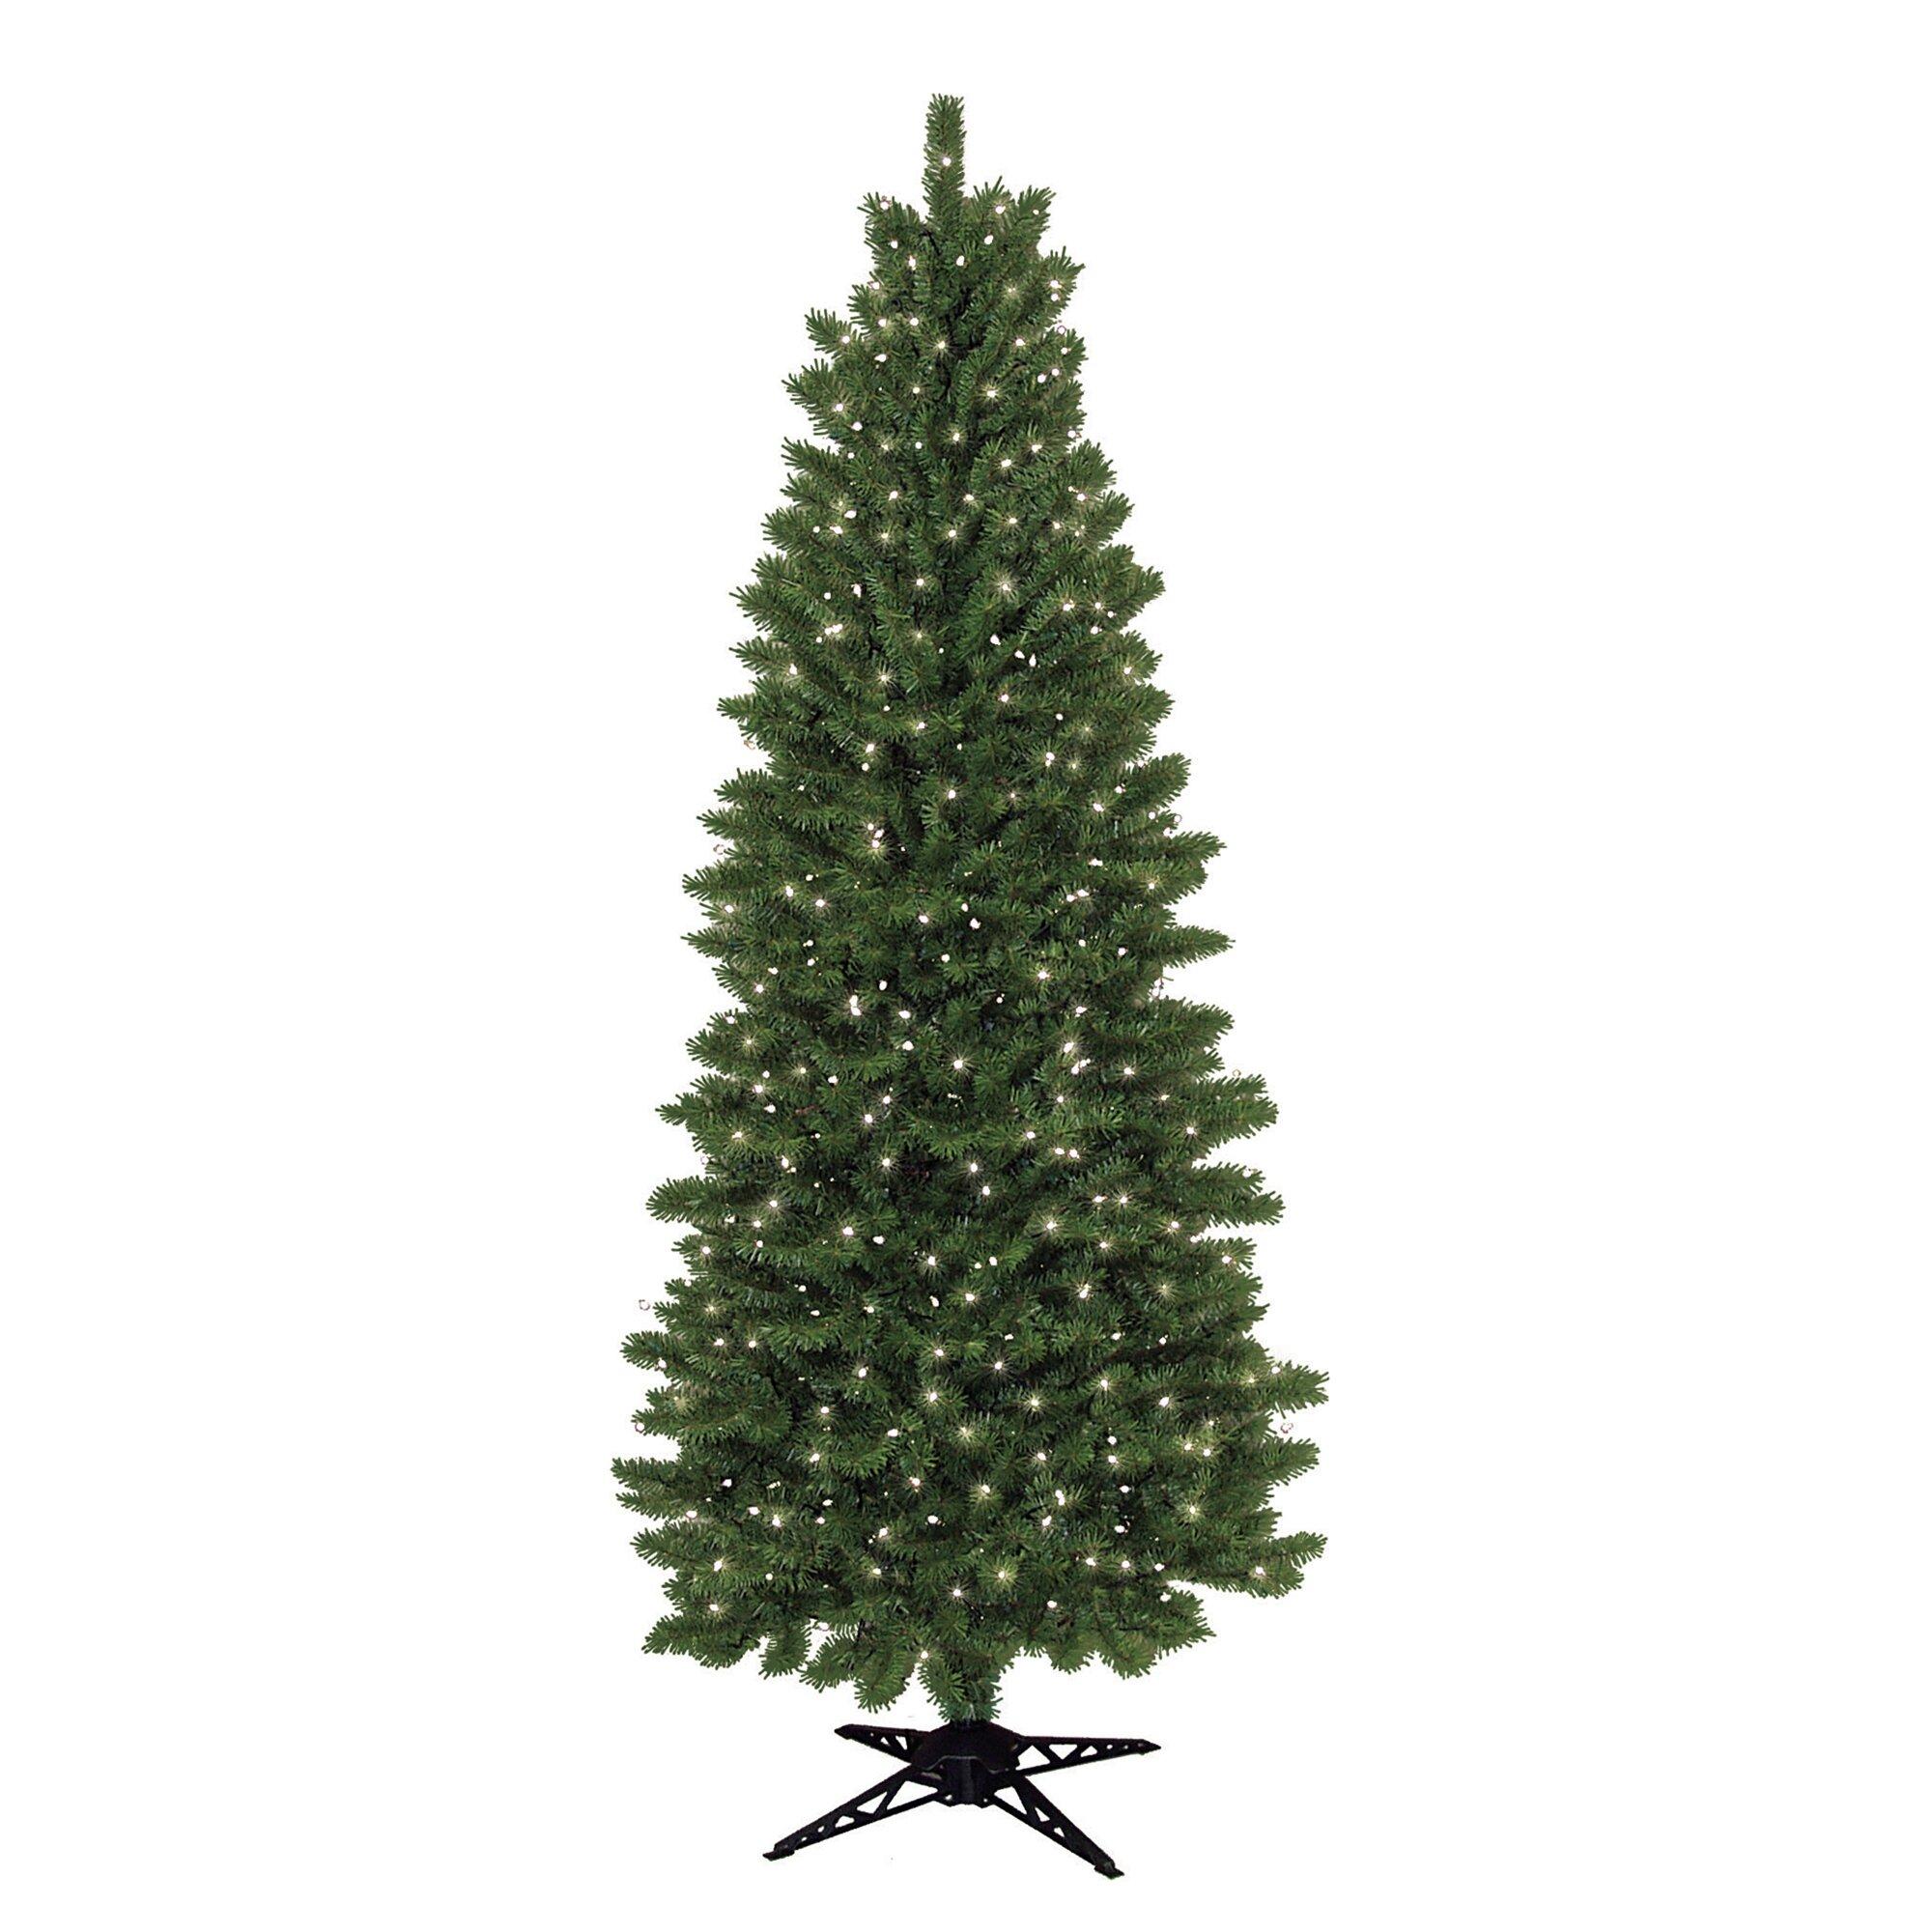 Next Slim Christmas Tree: General Foam Plastics 7' Slim Spruce Artificial Christmas